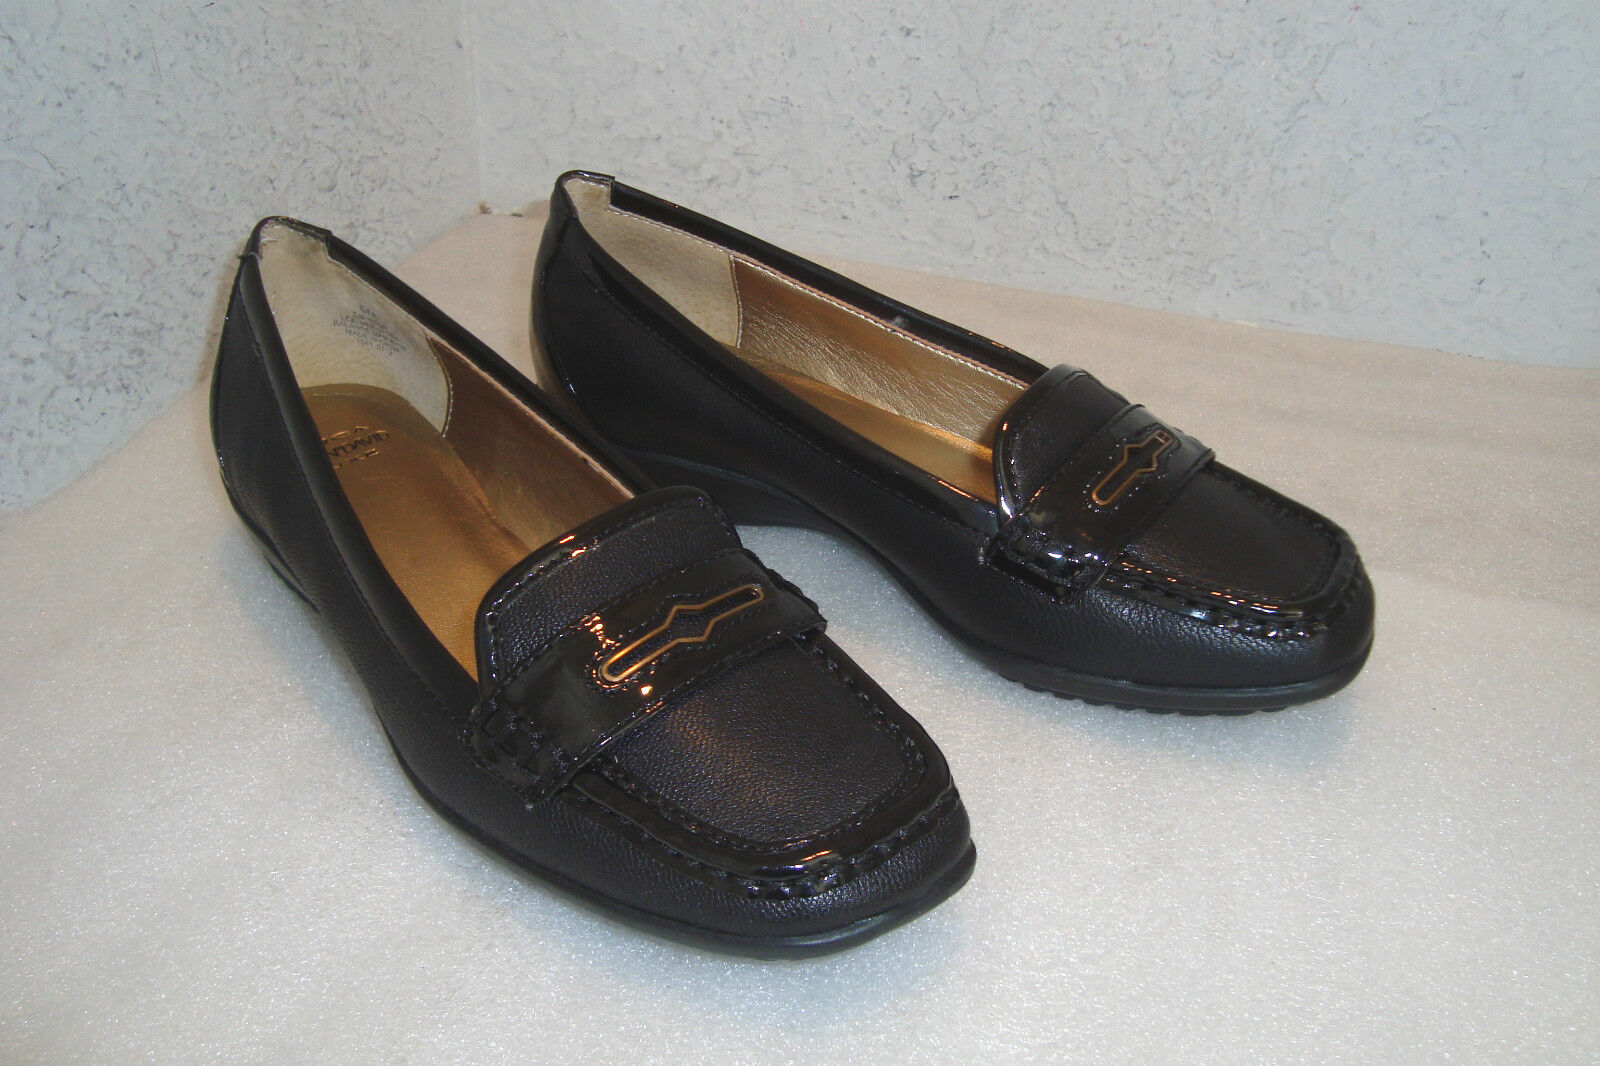 Circa Joan & David Luxe Damenschuhe Finton Leder Flats Schuhes 6 MED Preowned